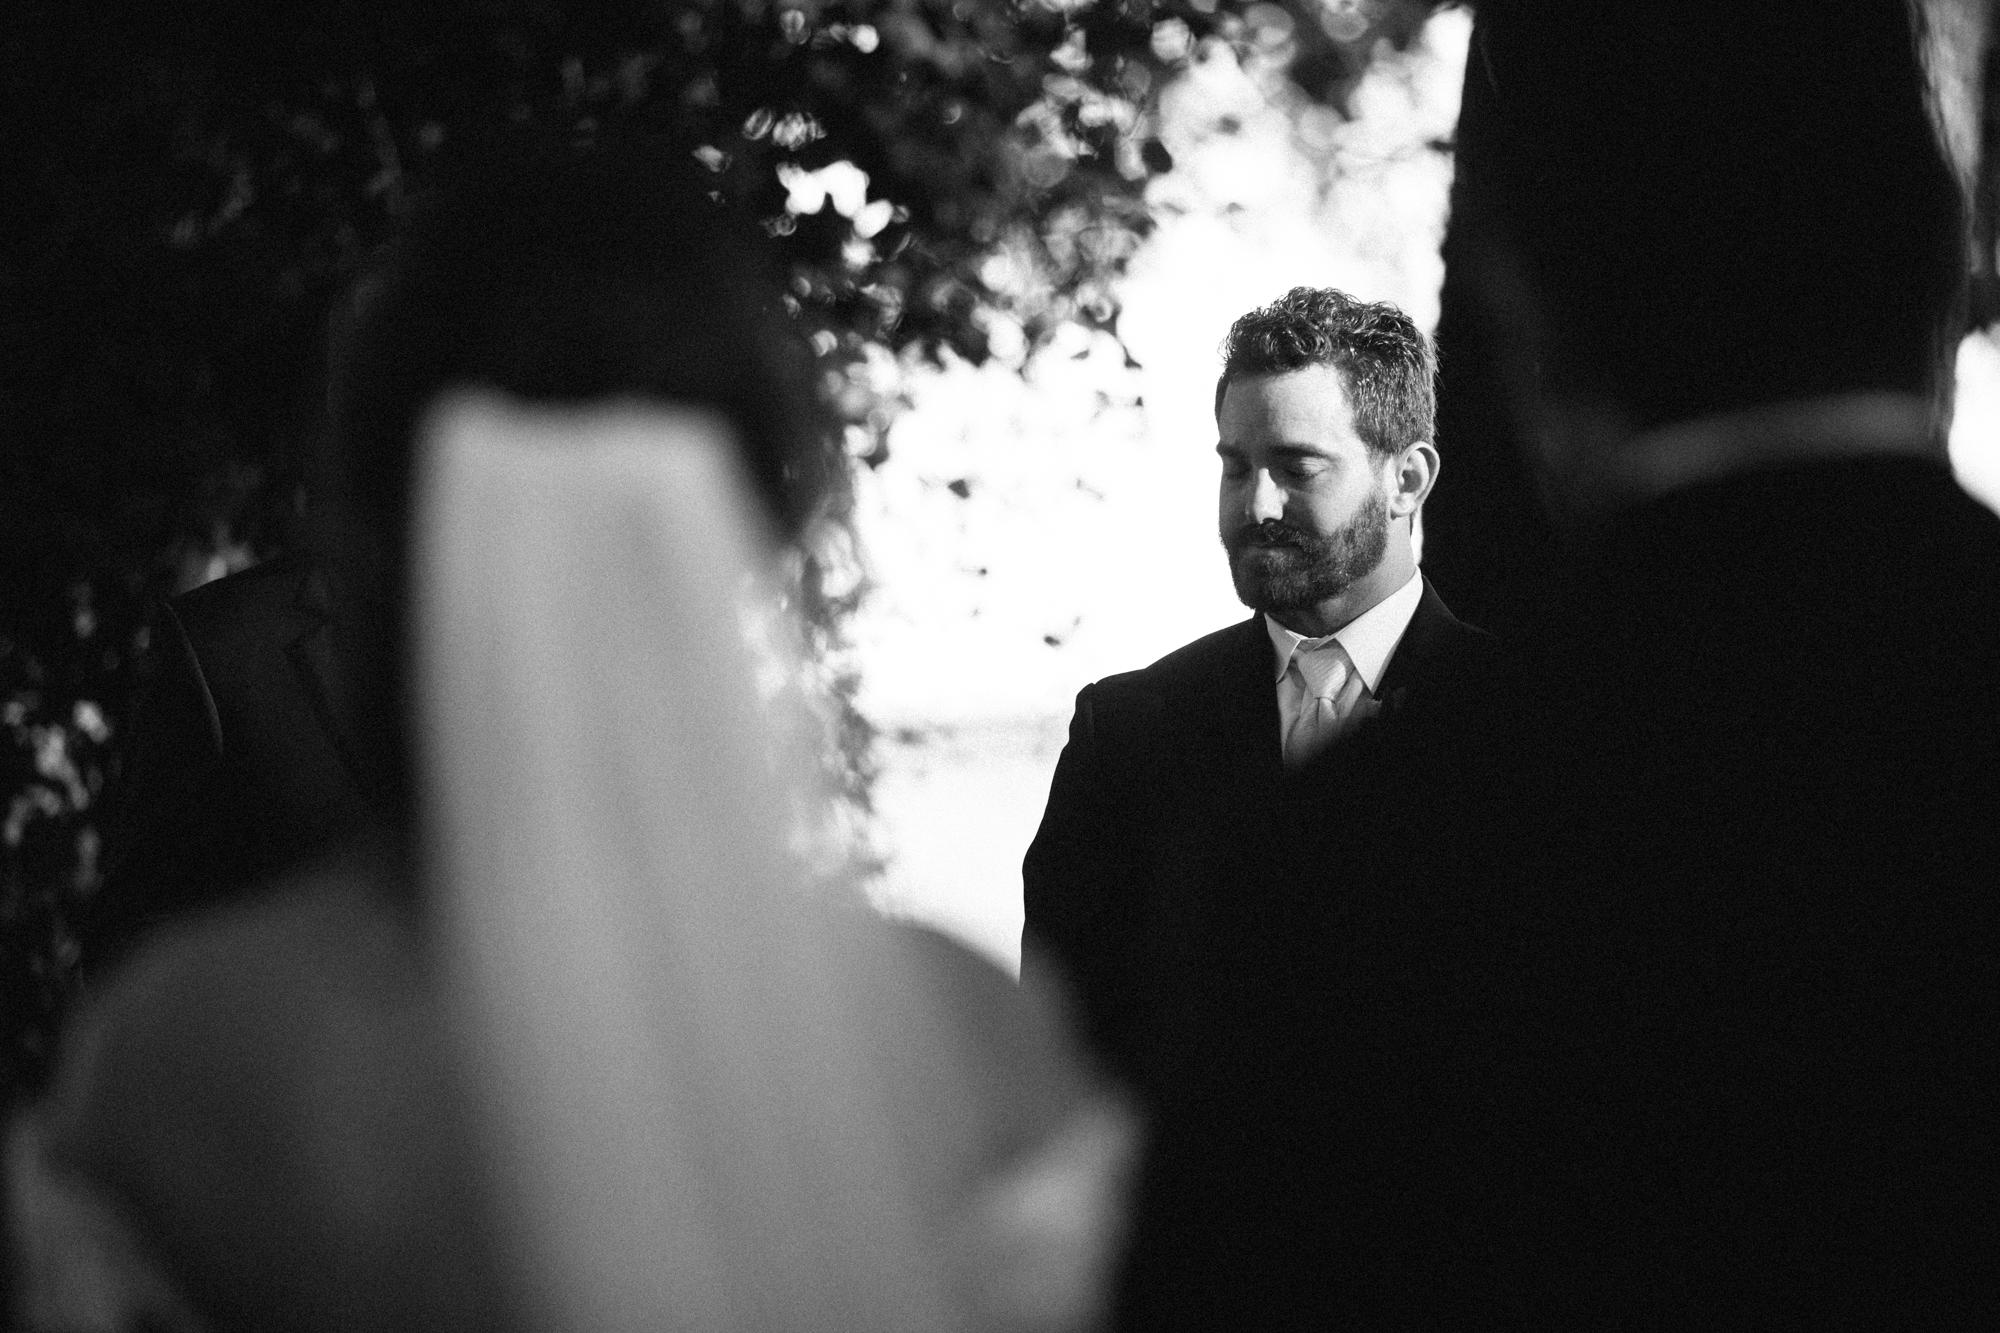 Gautier_Wedding_Photographer-98.jpg